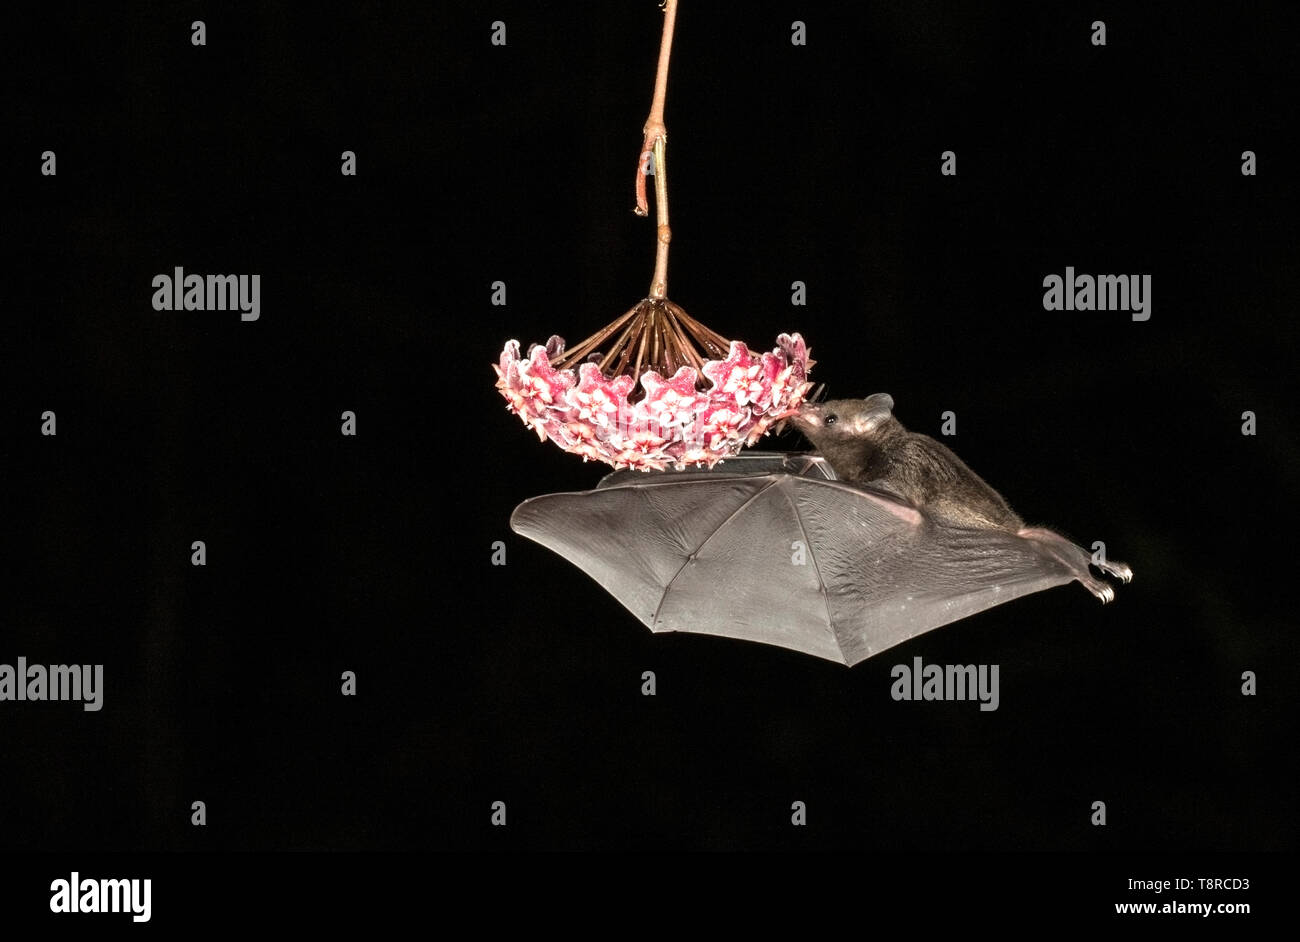 tropical bat, feeding on nectar on flower in rainforest at night, Laguna de Lagarto, Costa Rica 1 April 2019 - Stock Image